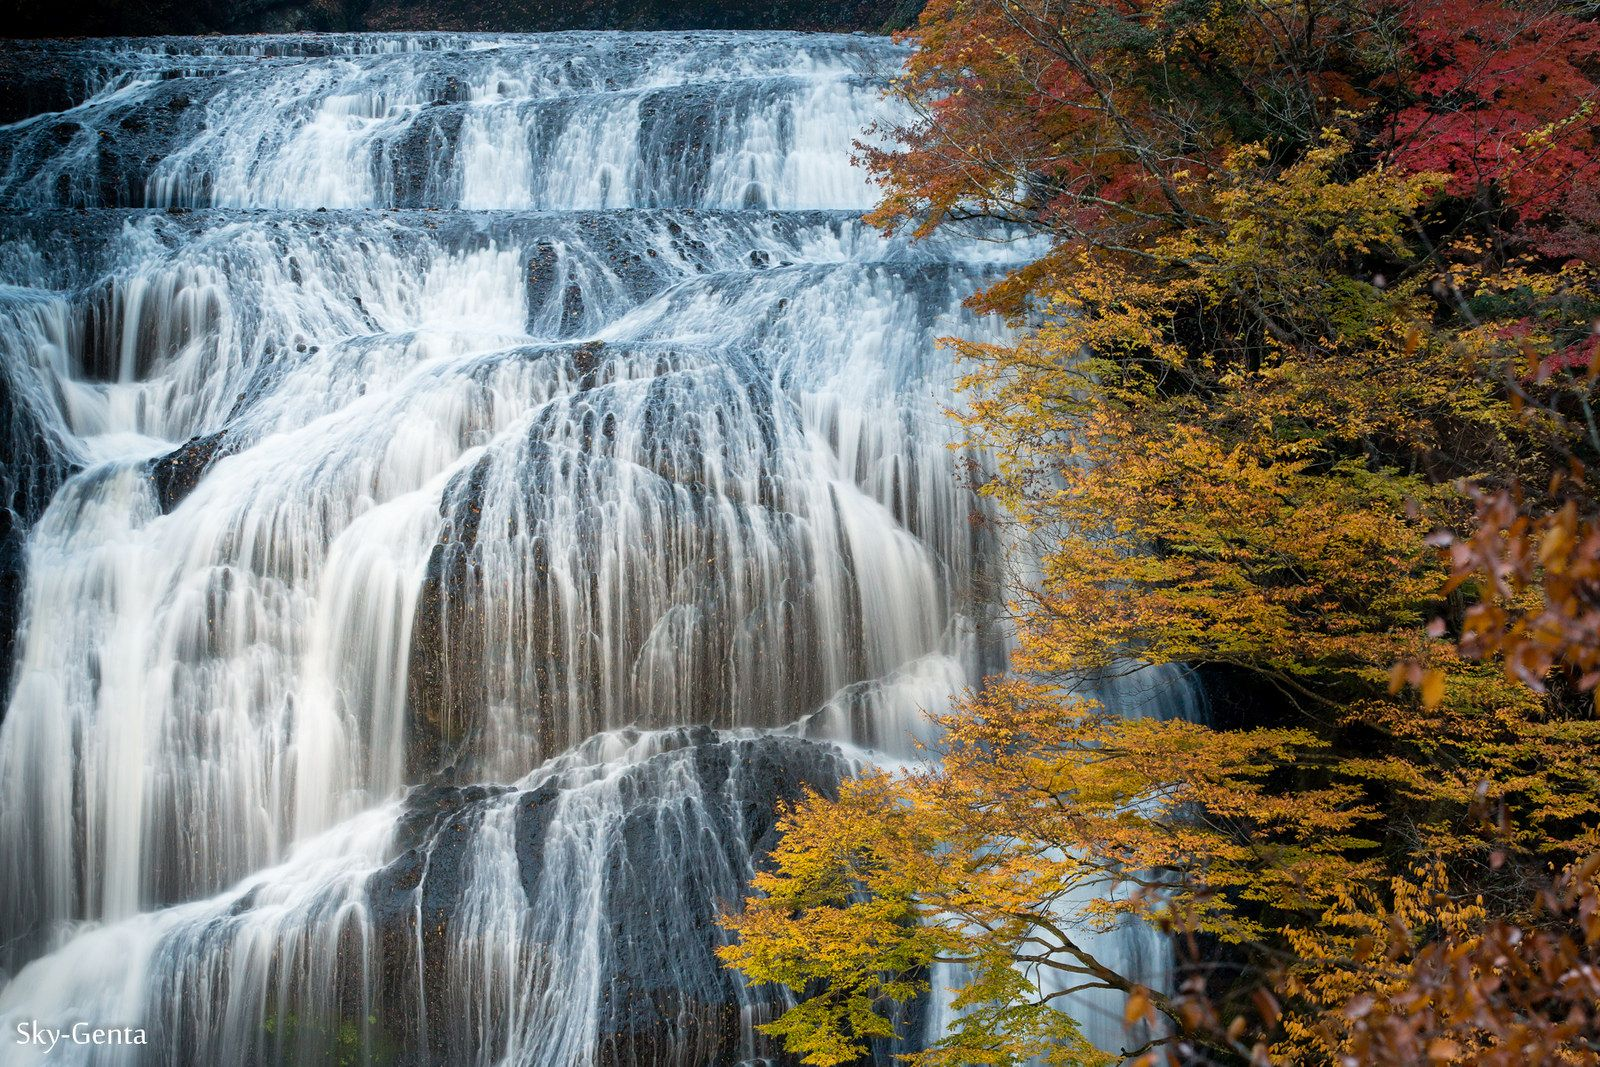 https://flic.kr/p/AJBkzh | Fukuroda falls | 袋田の滝 茨城県大子町